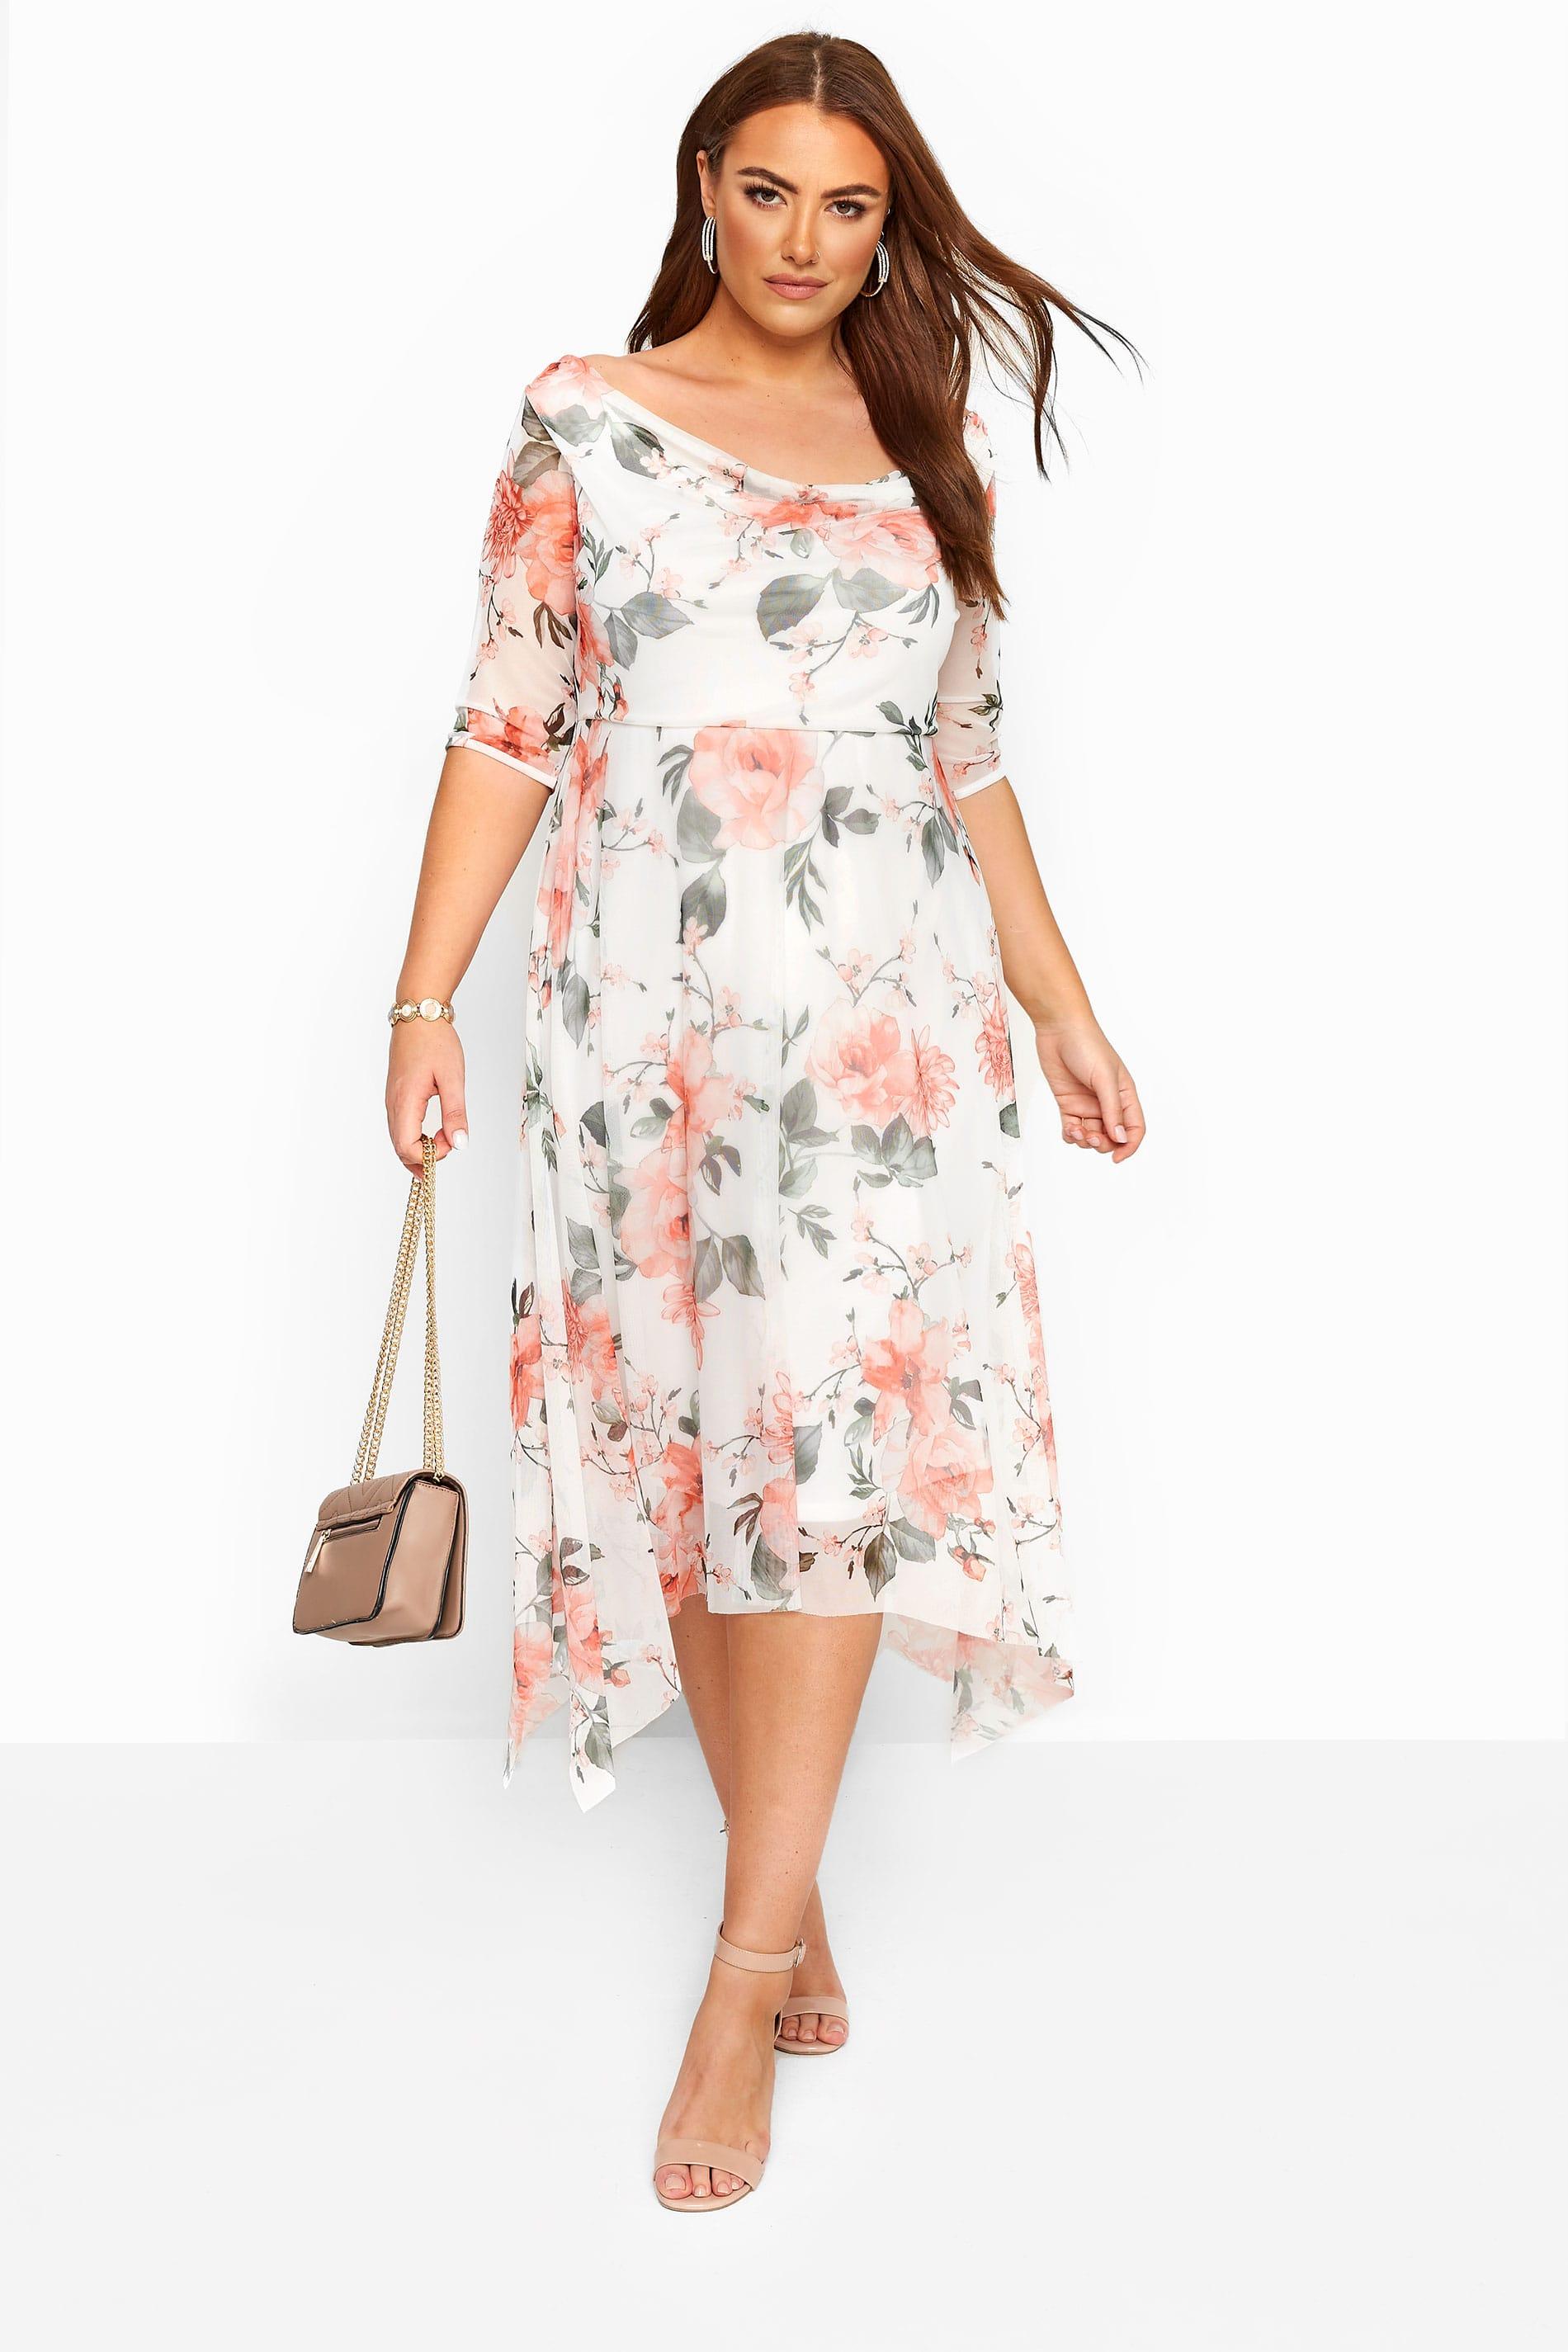 White Floral Cowl Neck Mesh Dress_b682.jpg